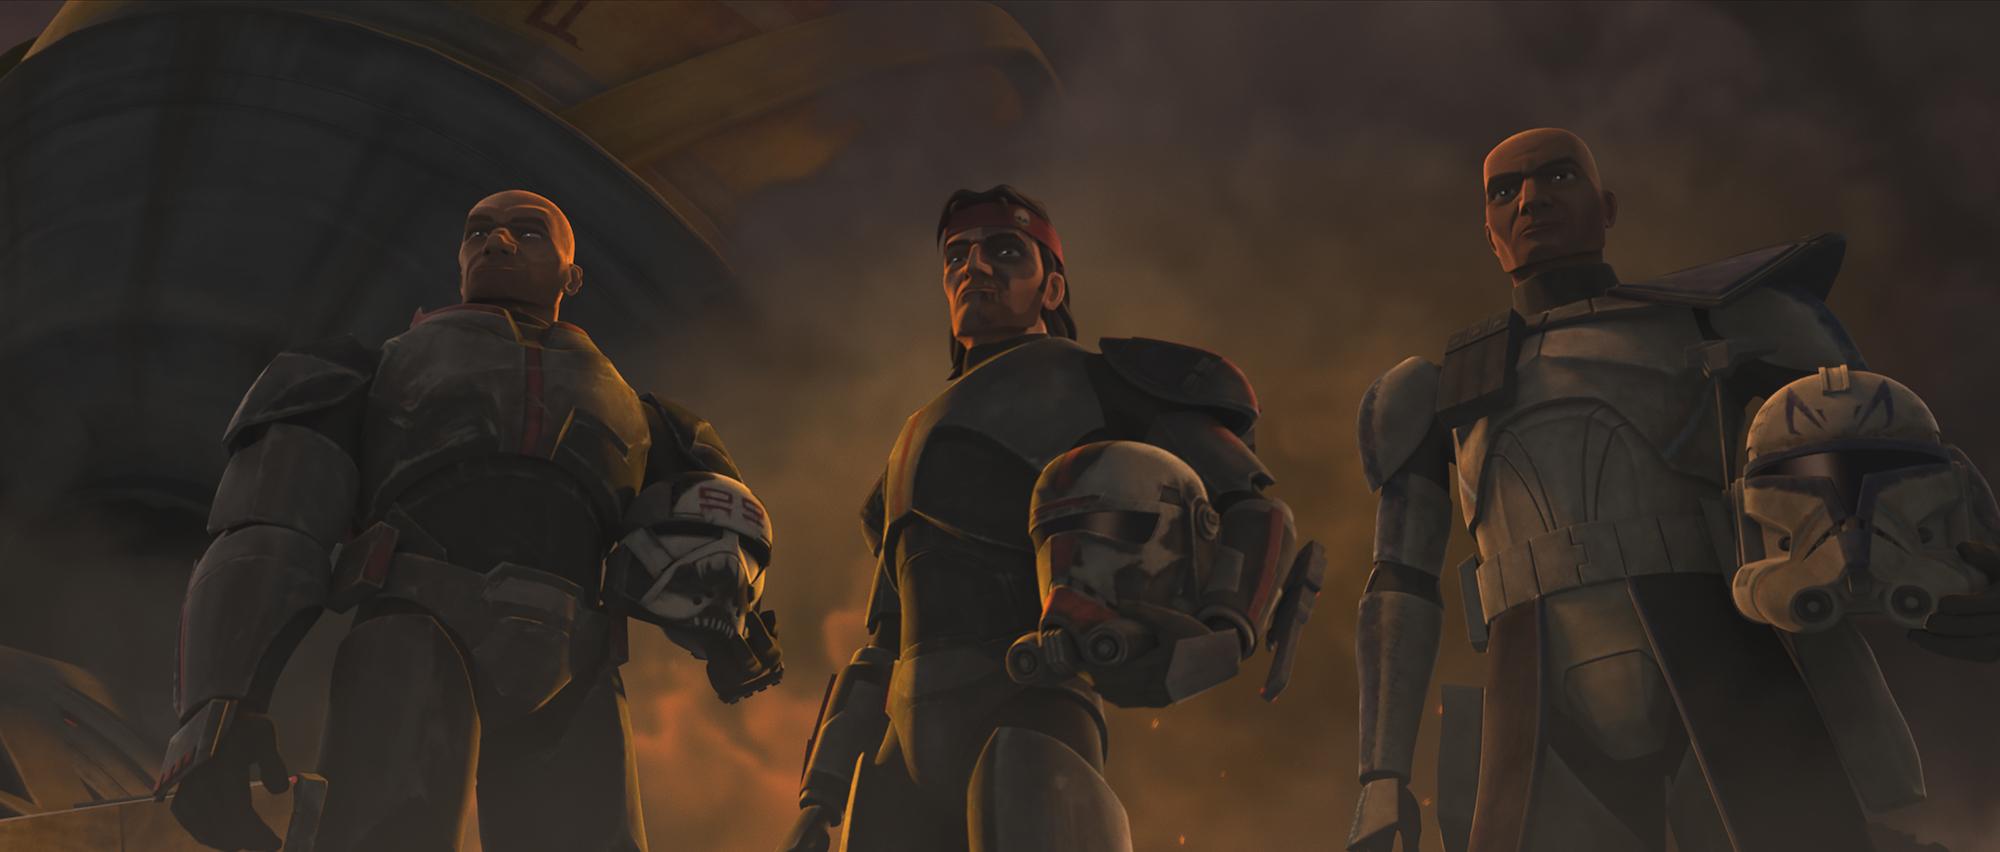 The Bad Batch in Season 7 of 'Star Wars: The Clone Wars'